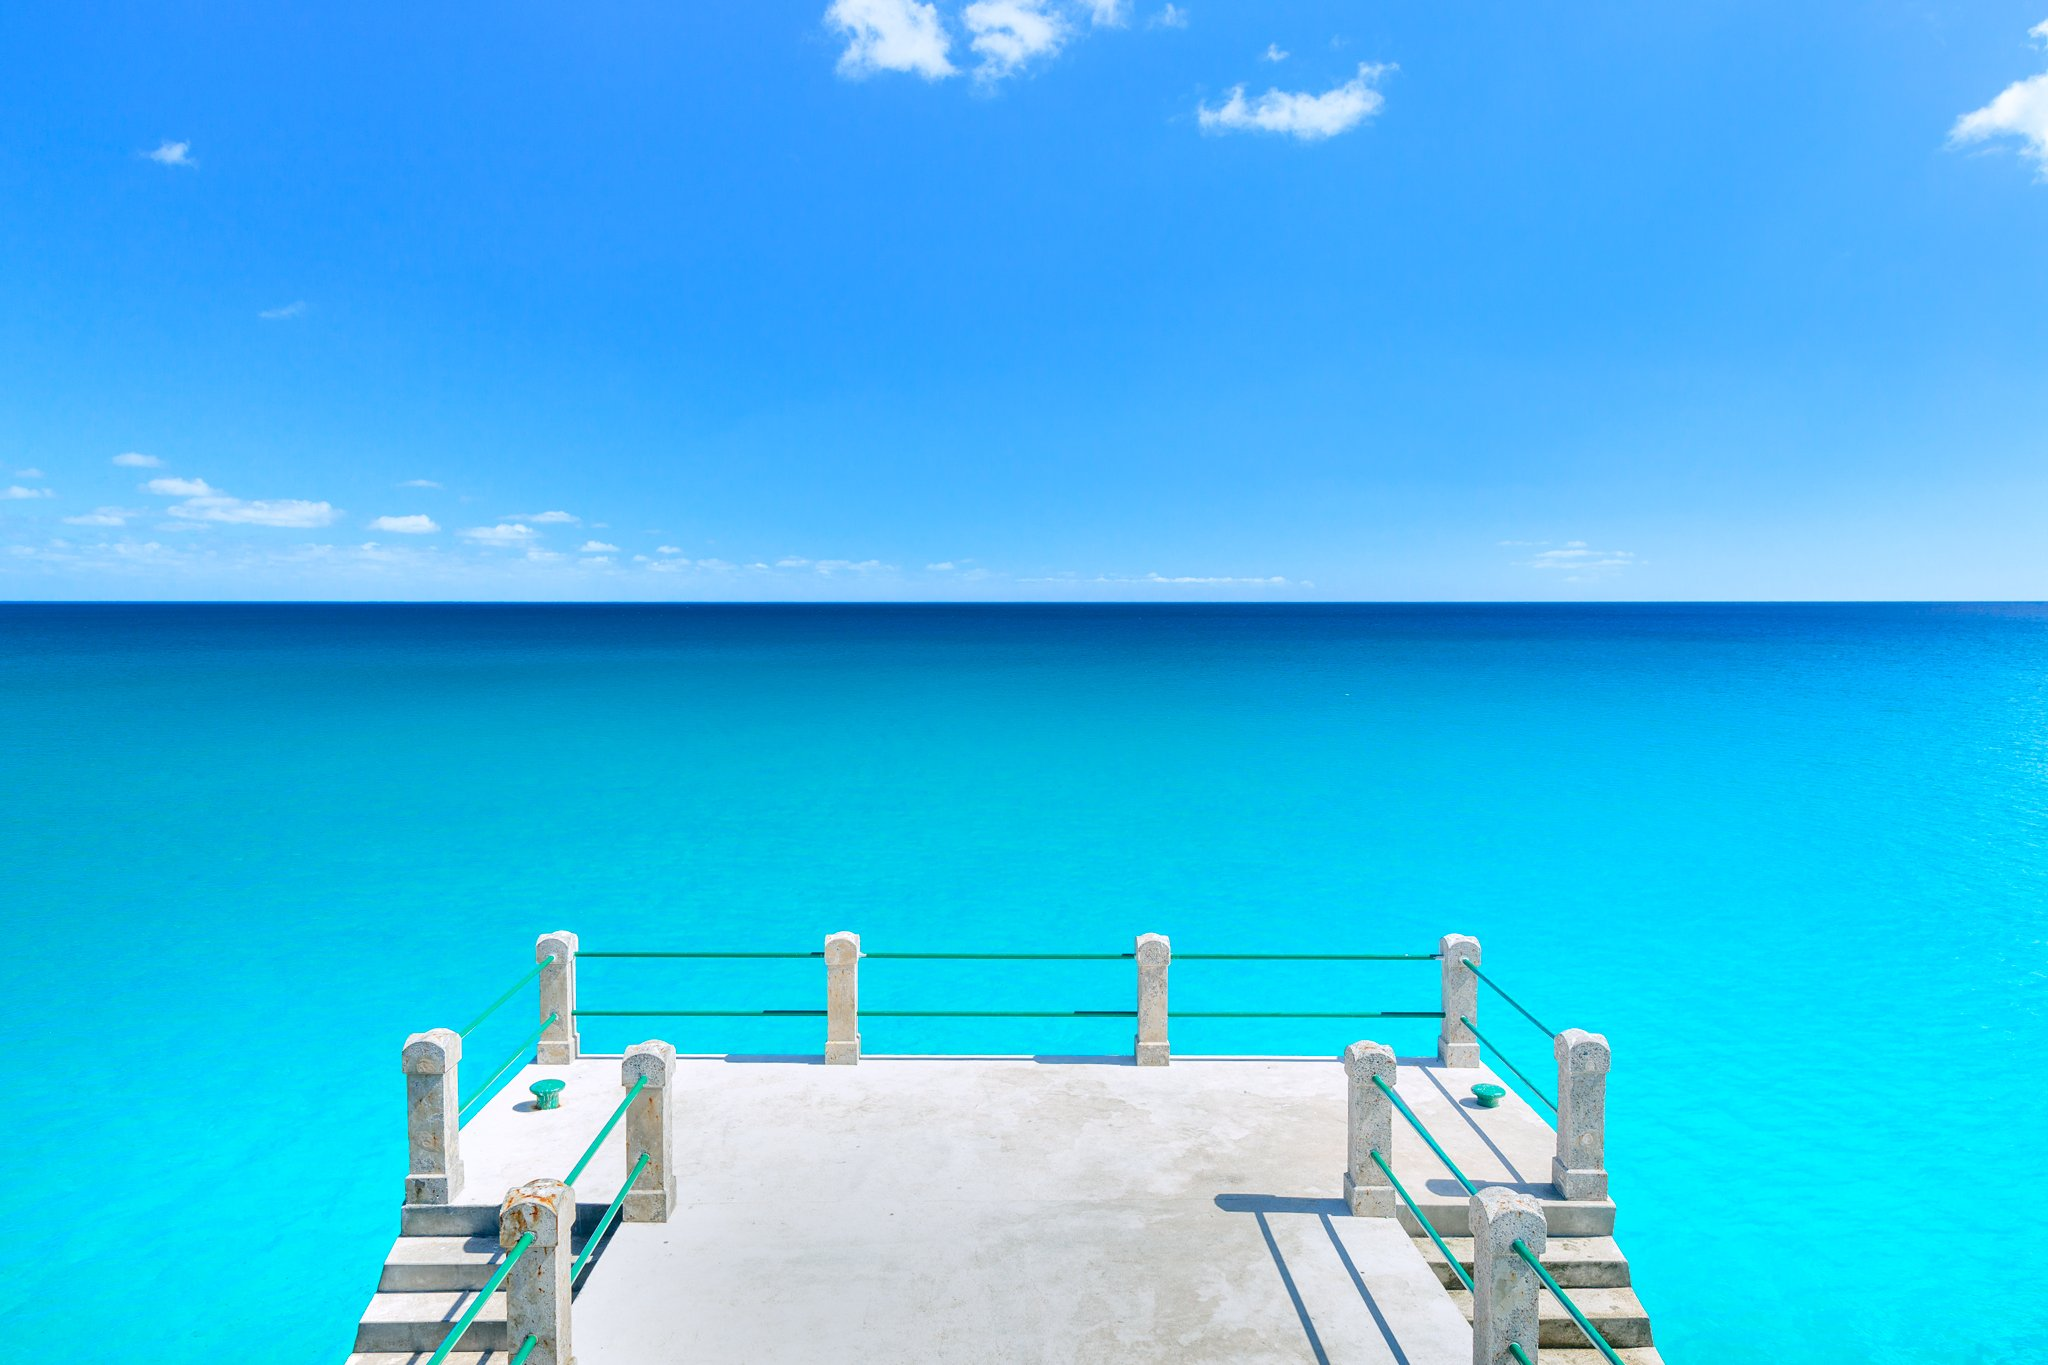 #portosanto #portugal #island #portugese #reach #turquoise #ocean #dock #water #naturalbeauty #earth #nature #atlanticocean #wonderland #amazingnature #clearwater #sunnyday #vilabaleria #lookout #horison #clouds #bluesky #freedom #dream #vacation #travel , Marko Radovanovic